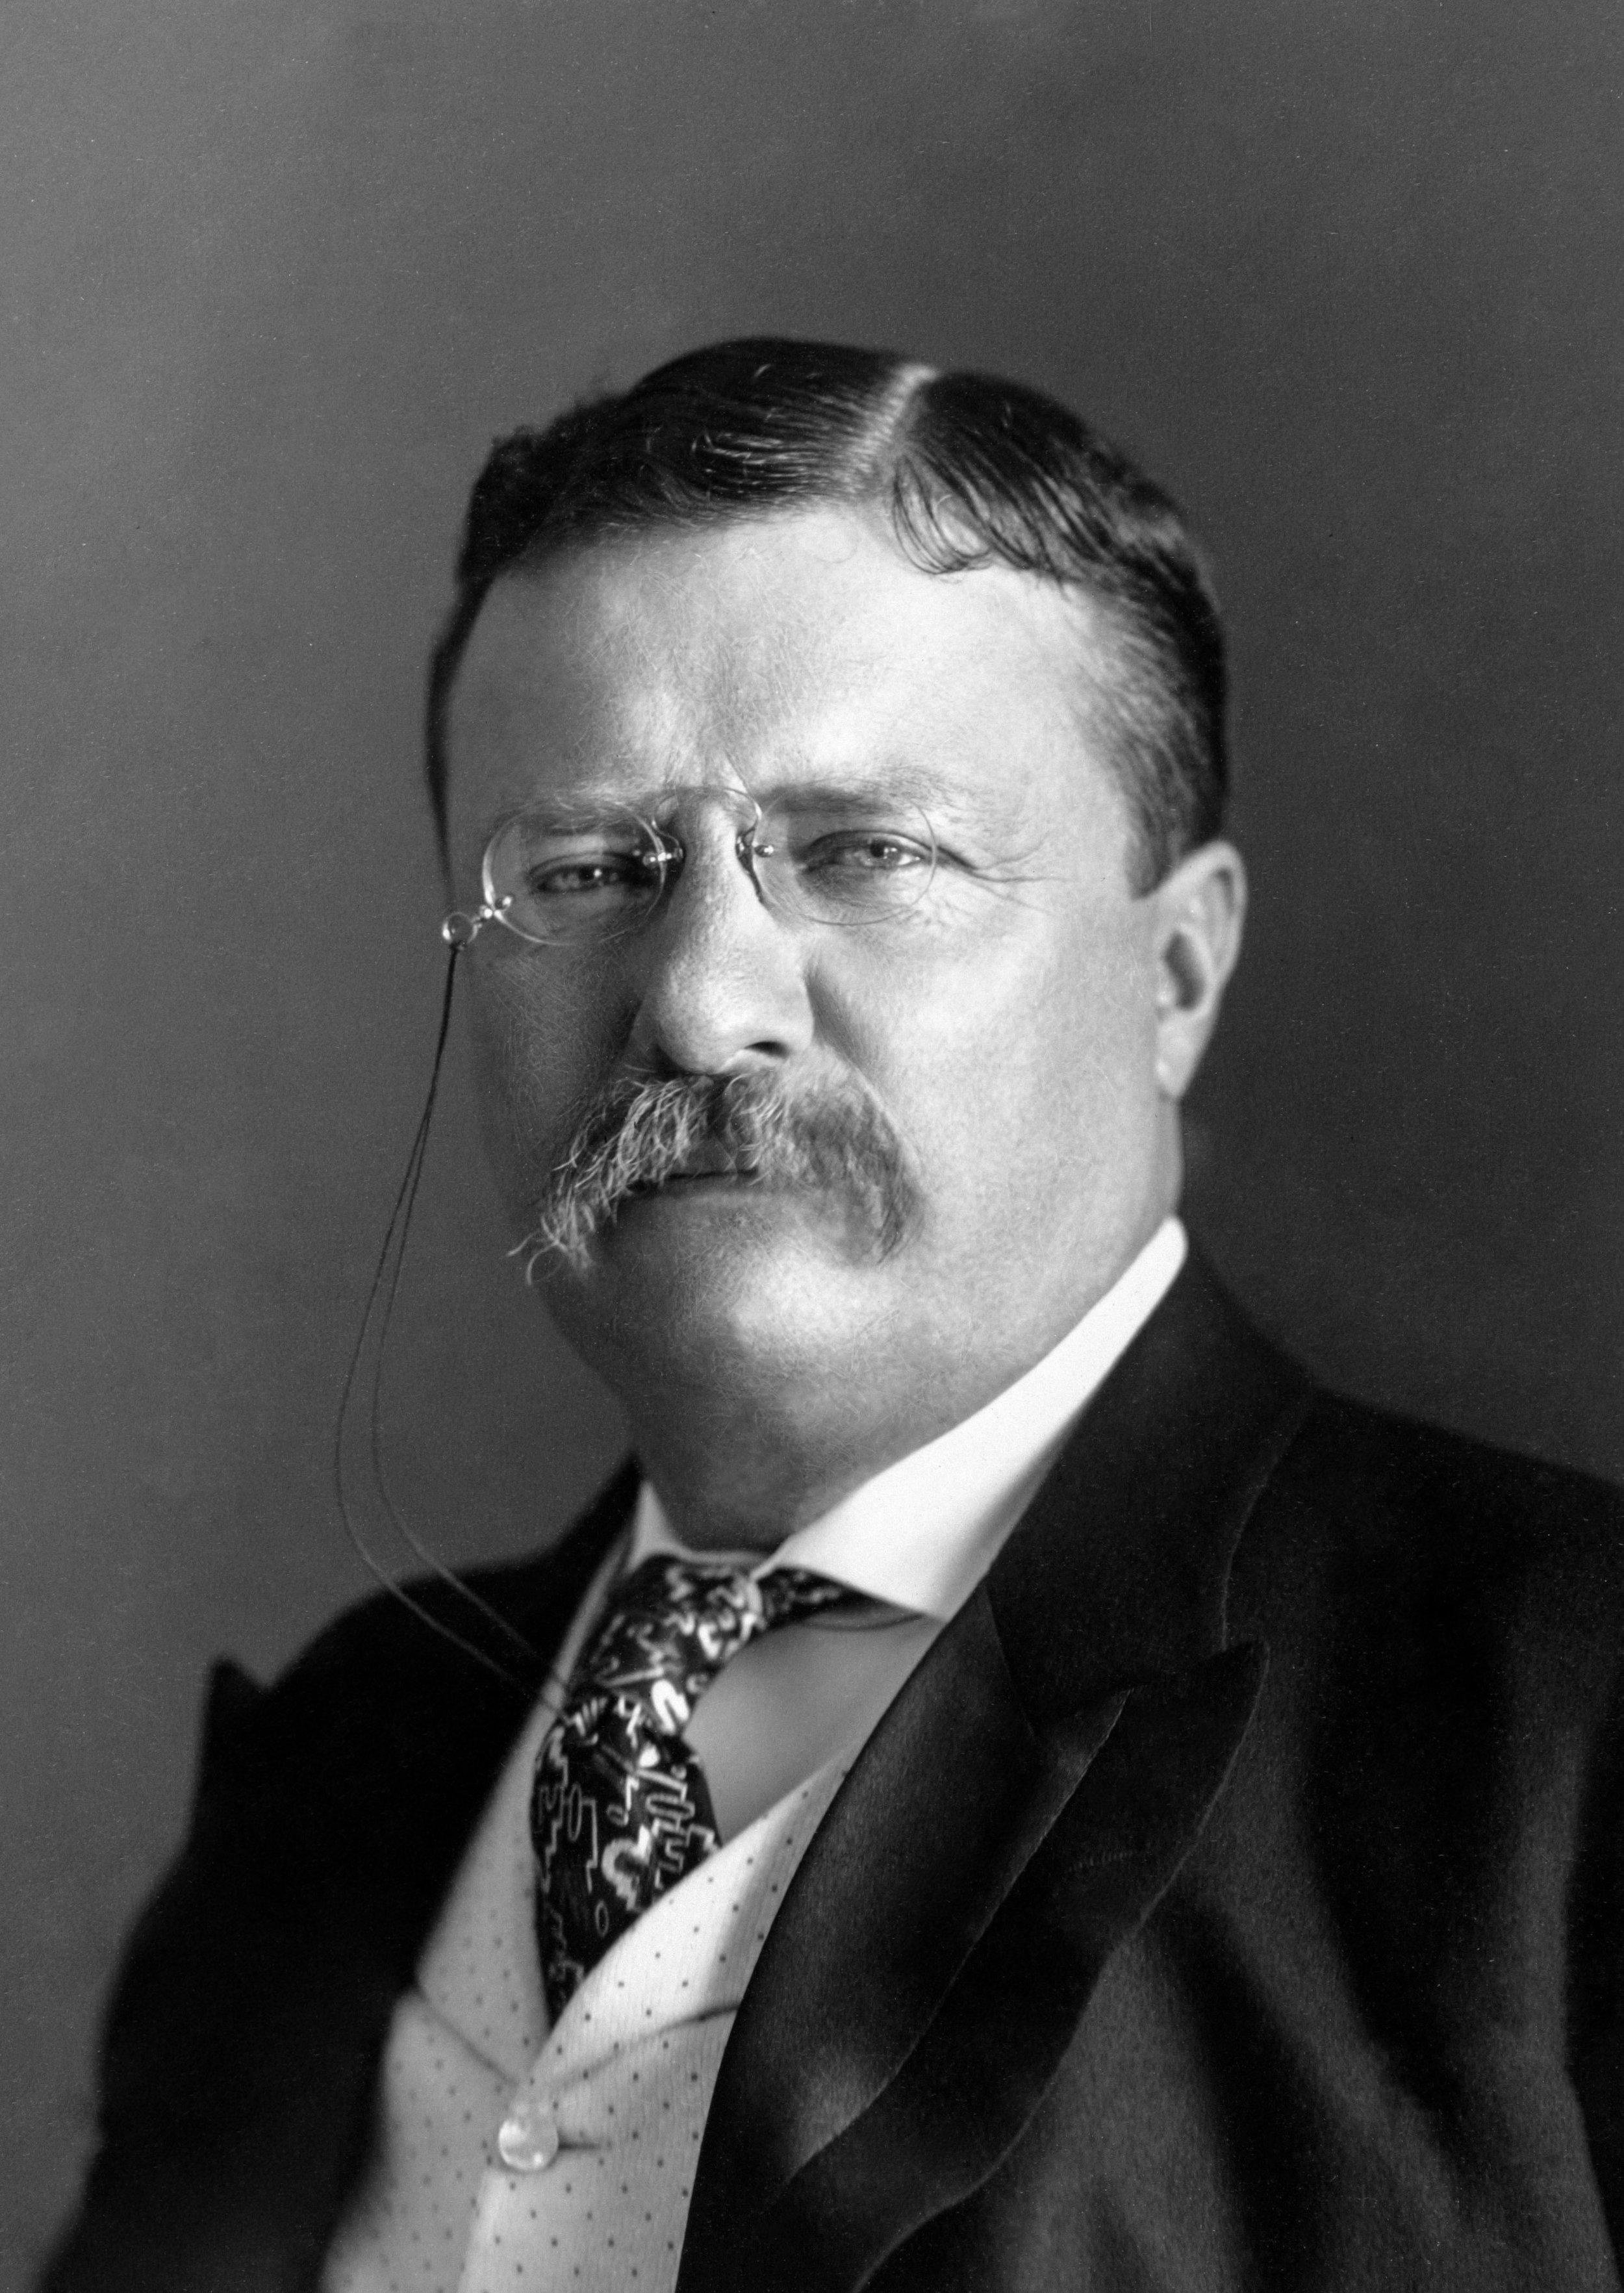 President_Roosevelt_-_Pach_Bros.jpg